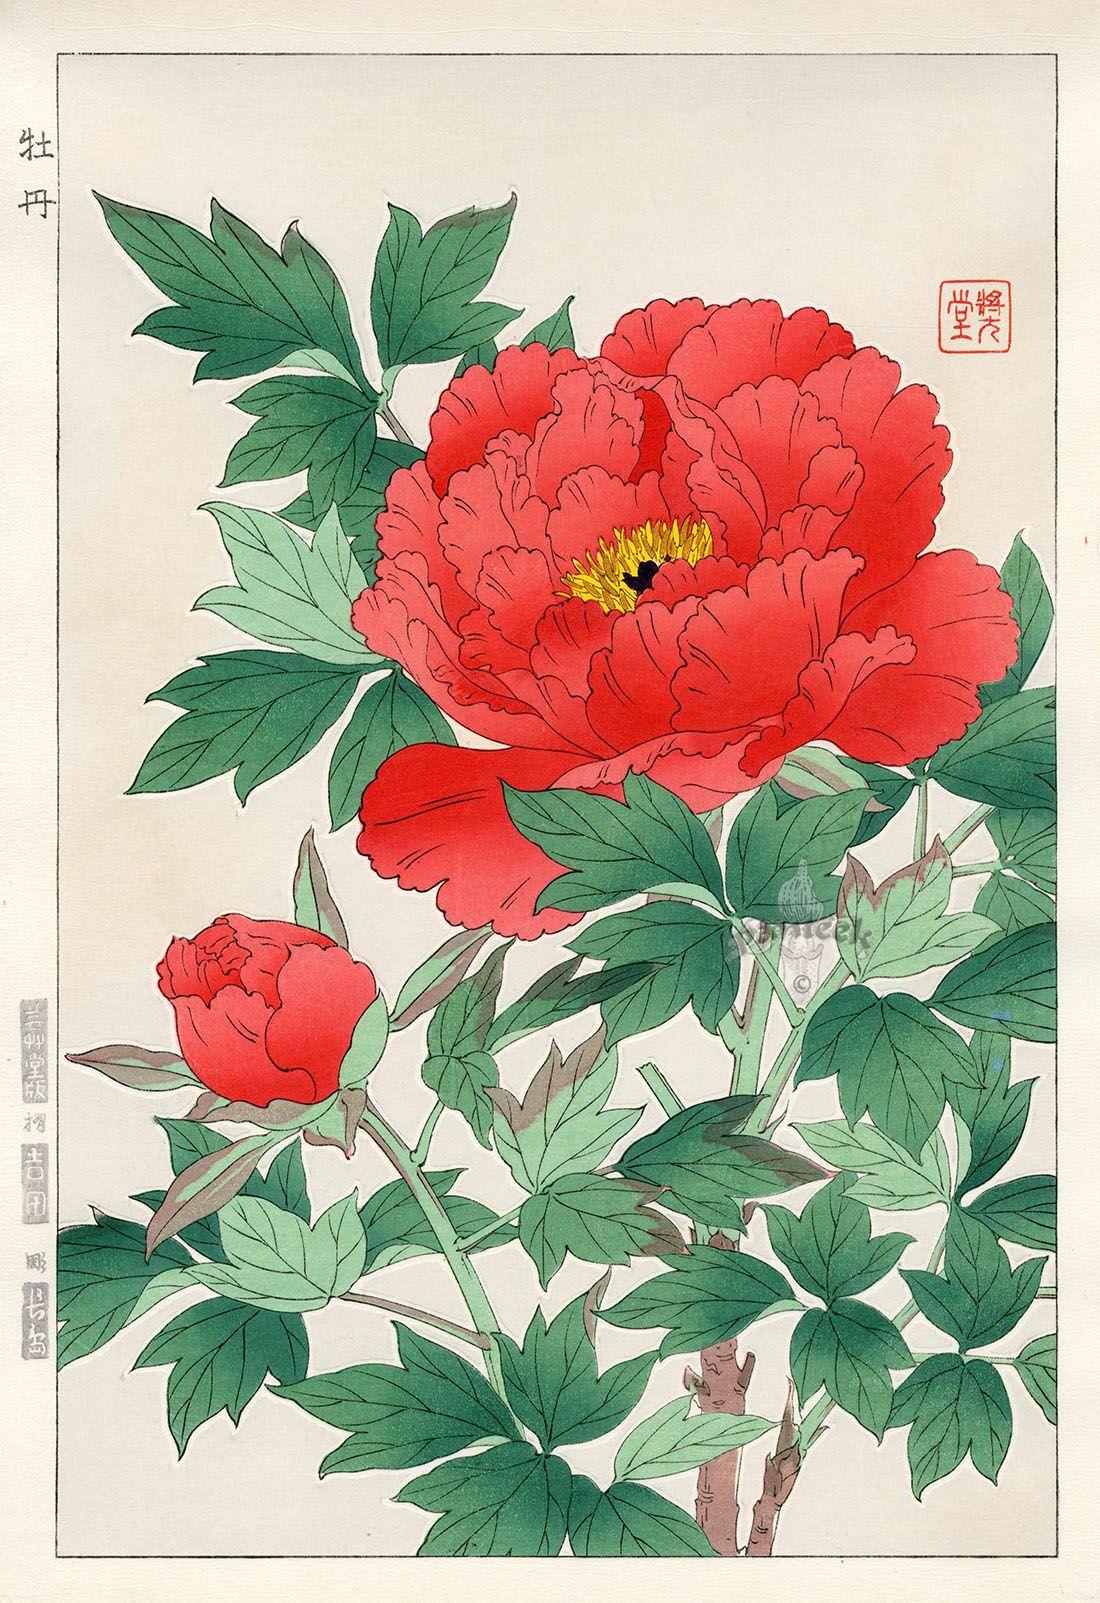 peony from shodo kawarazaki spring flower japanese woodblock prints アジアのアート 日本美術 アジアの花